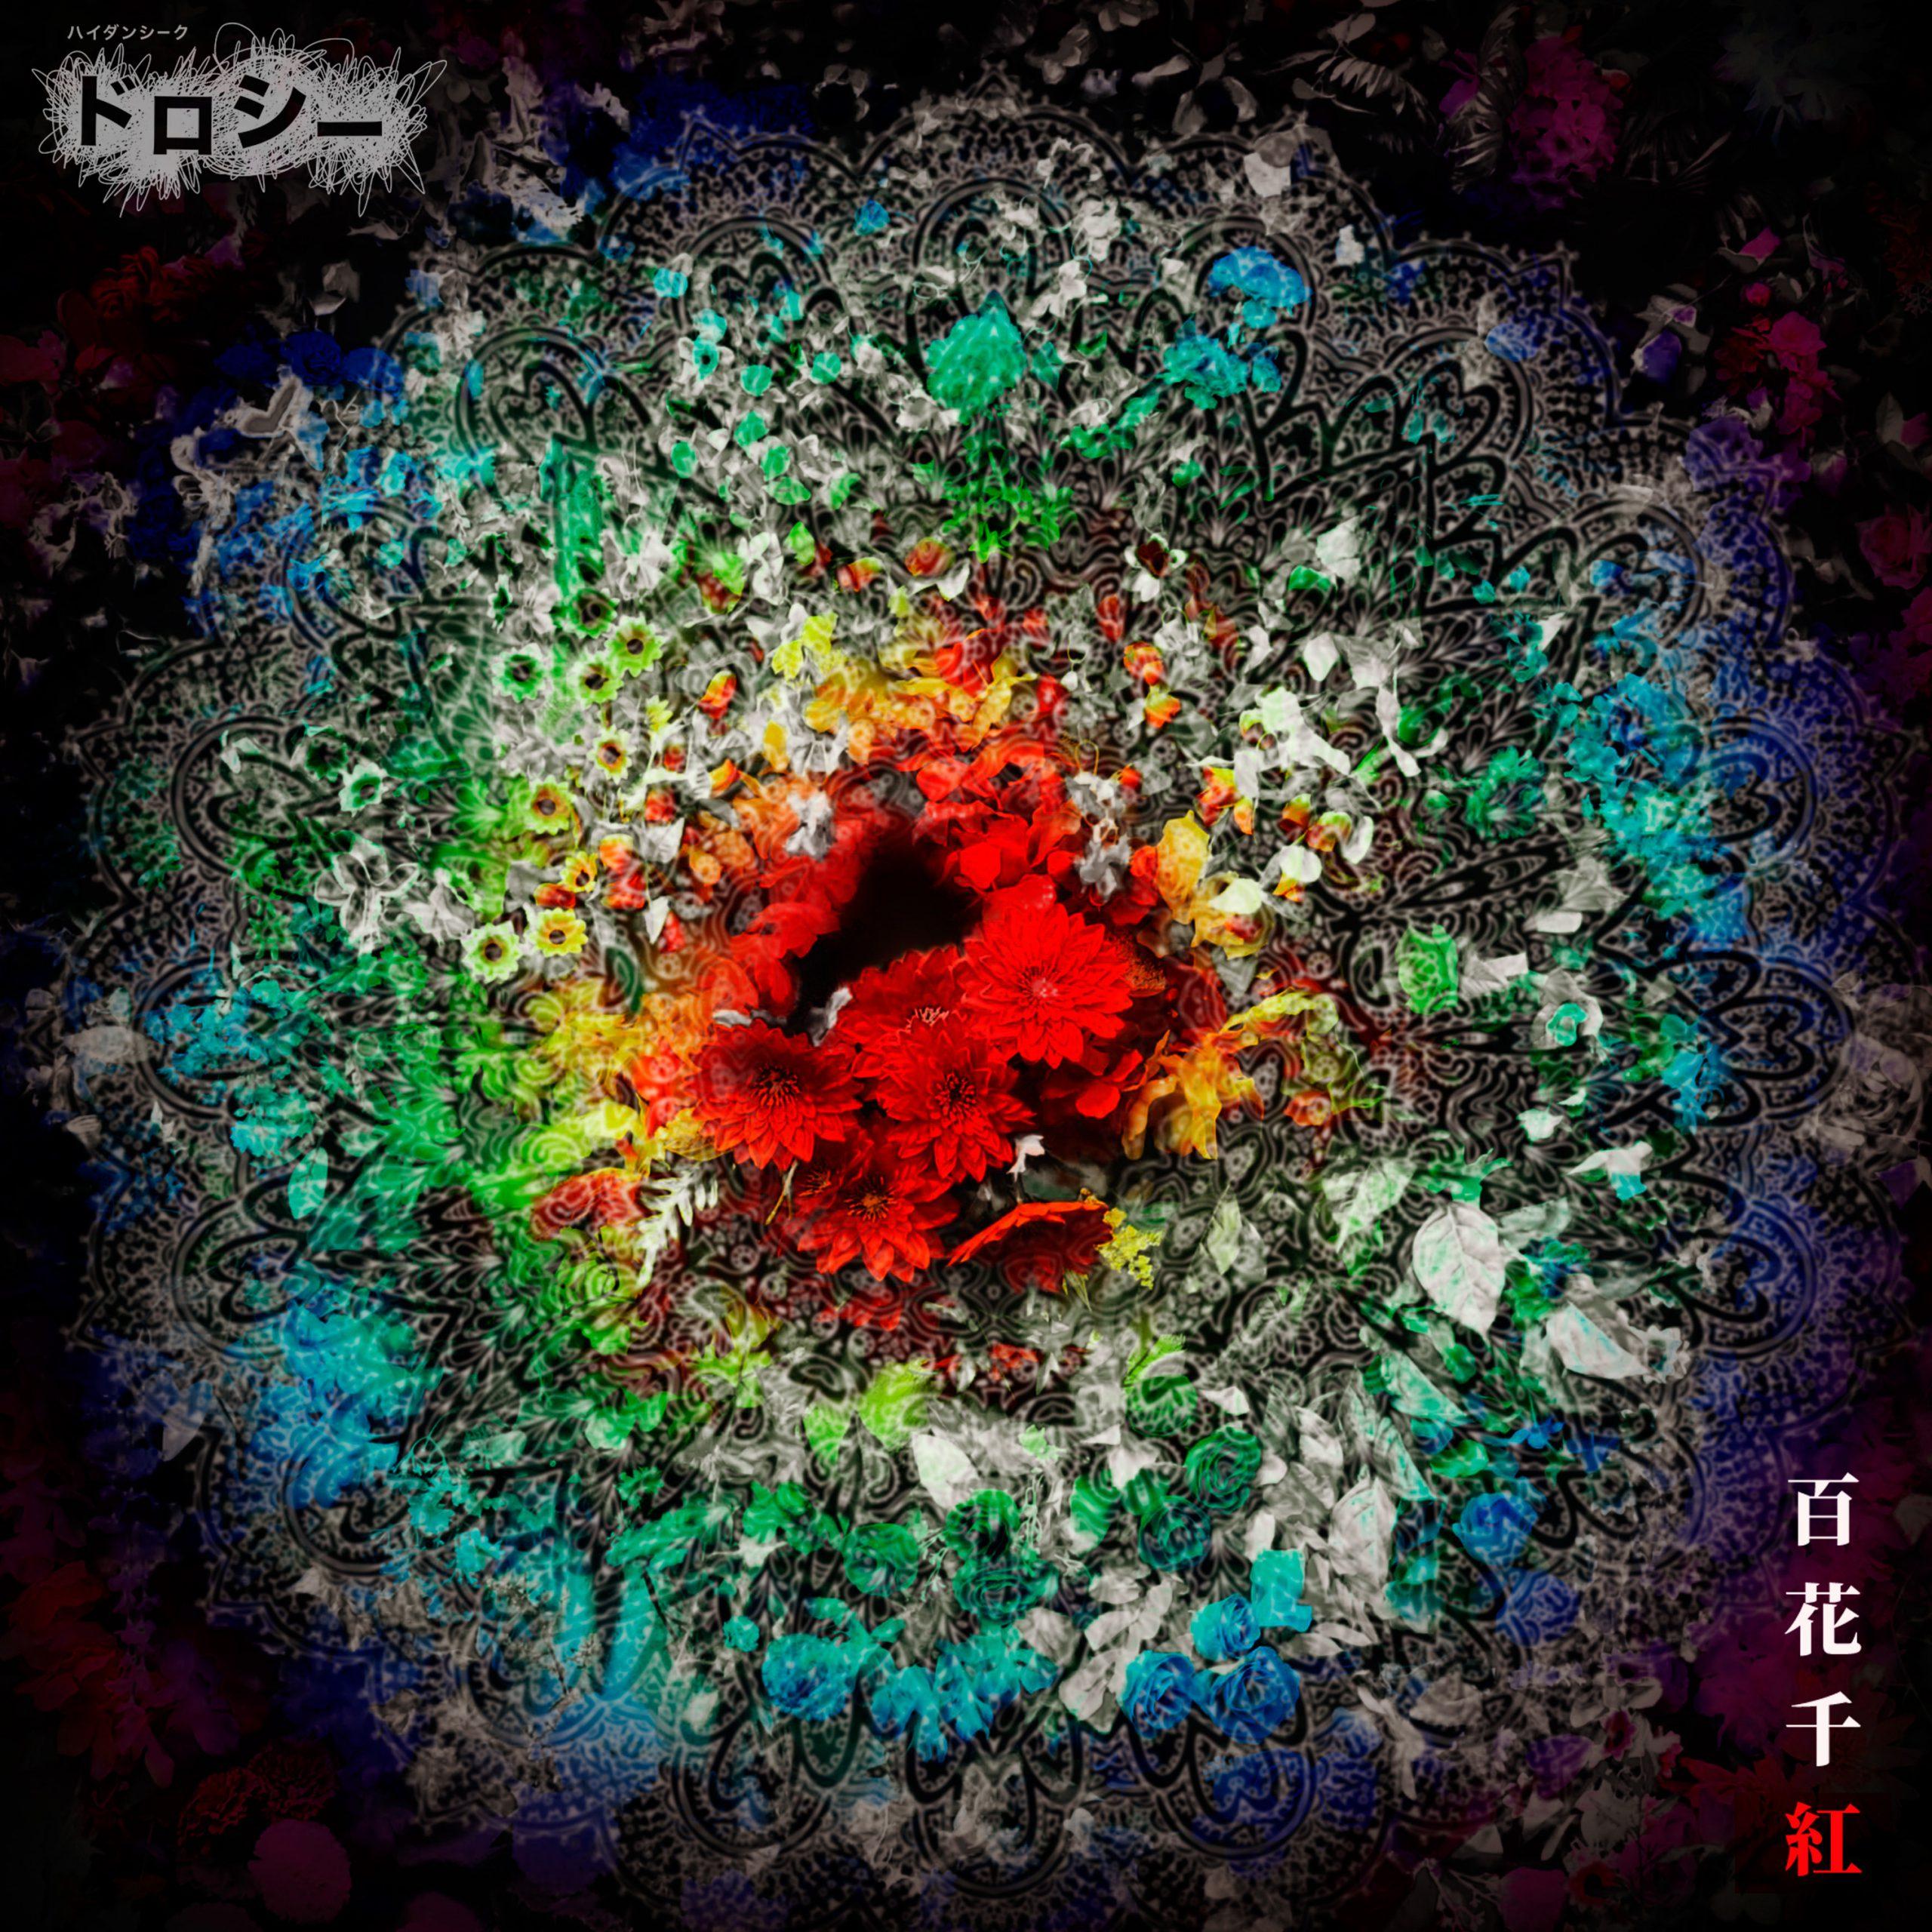 4th digital single「百花千紅」